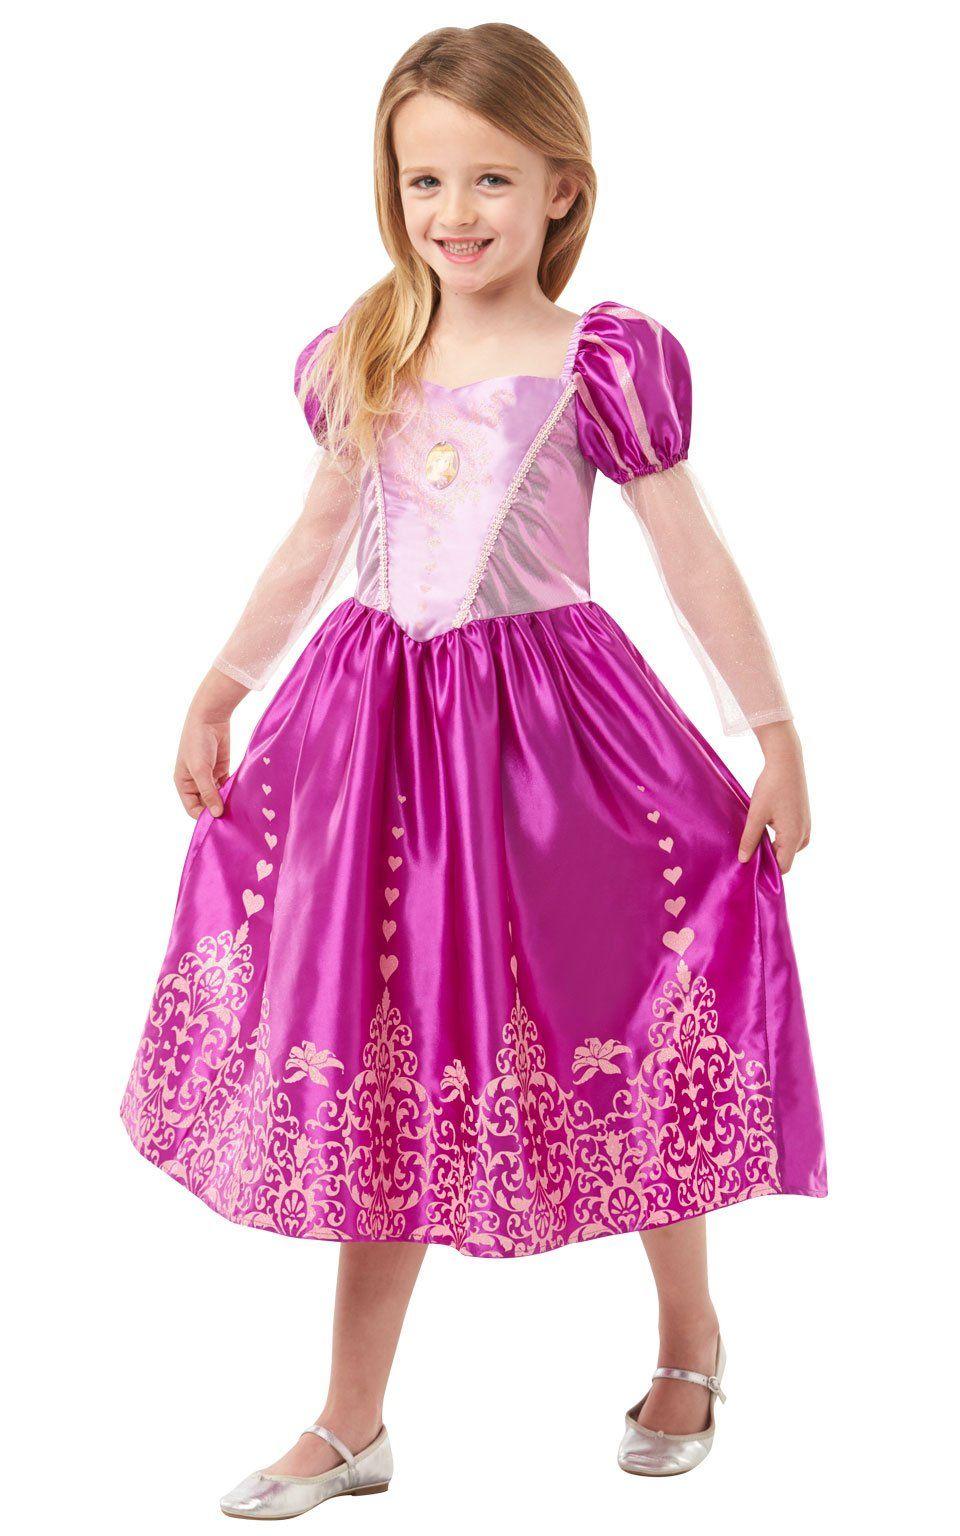 Costume CARNEVALE DISNEY RAPUNZEL Classic Tangled Big Print Rubies by Brand TOYS